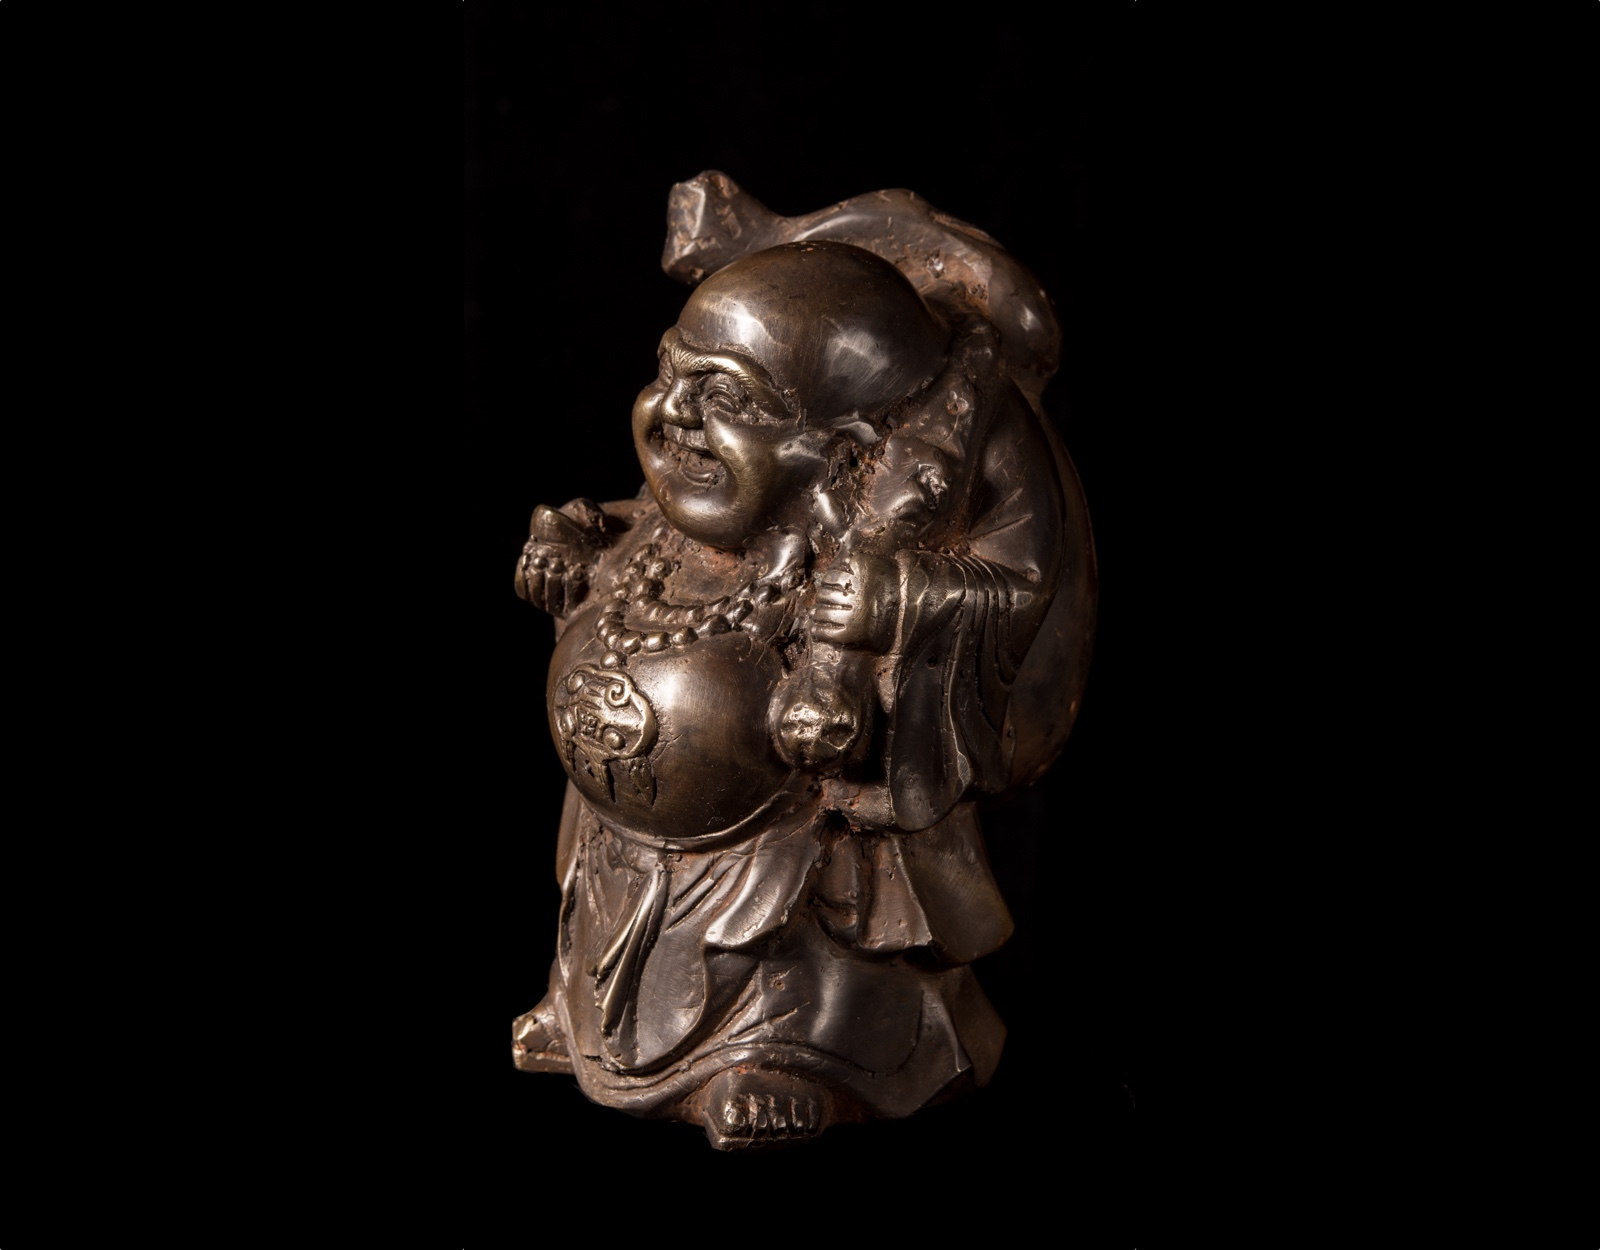 Бронзовая статуя Хотей бог богатства фото VipKeris